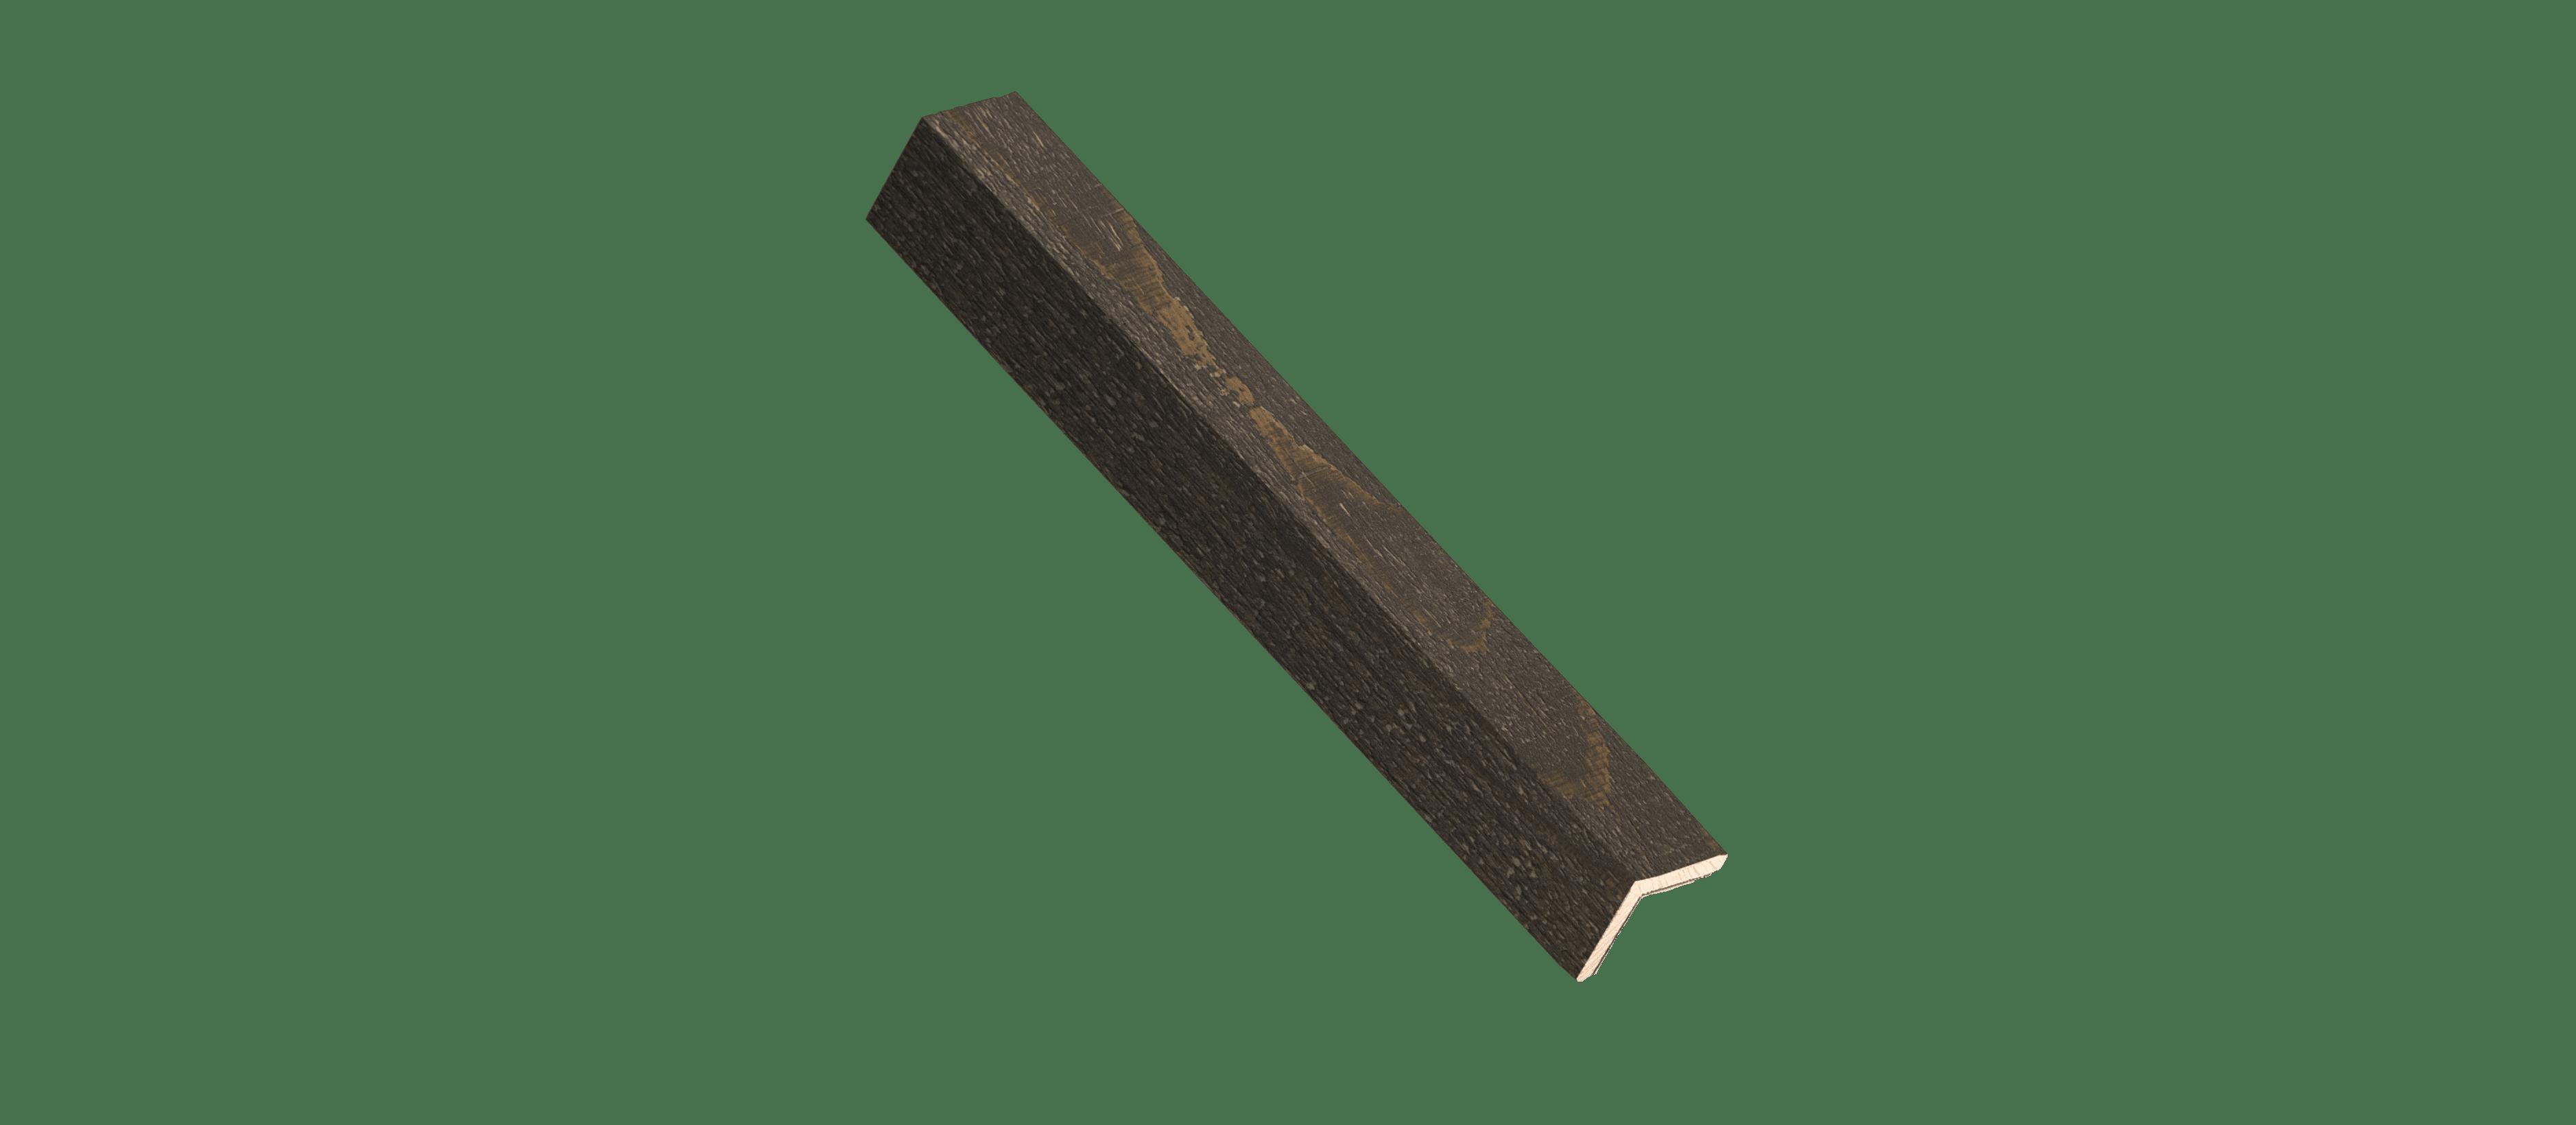 Graystone Wood Corner Trim Sample